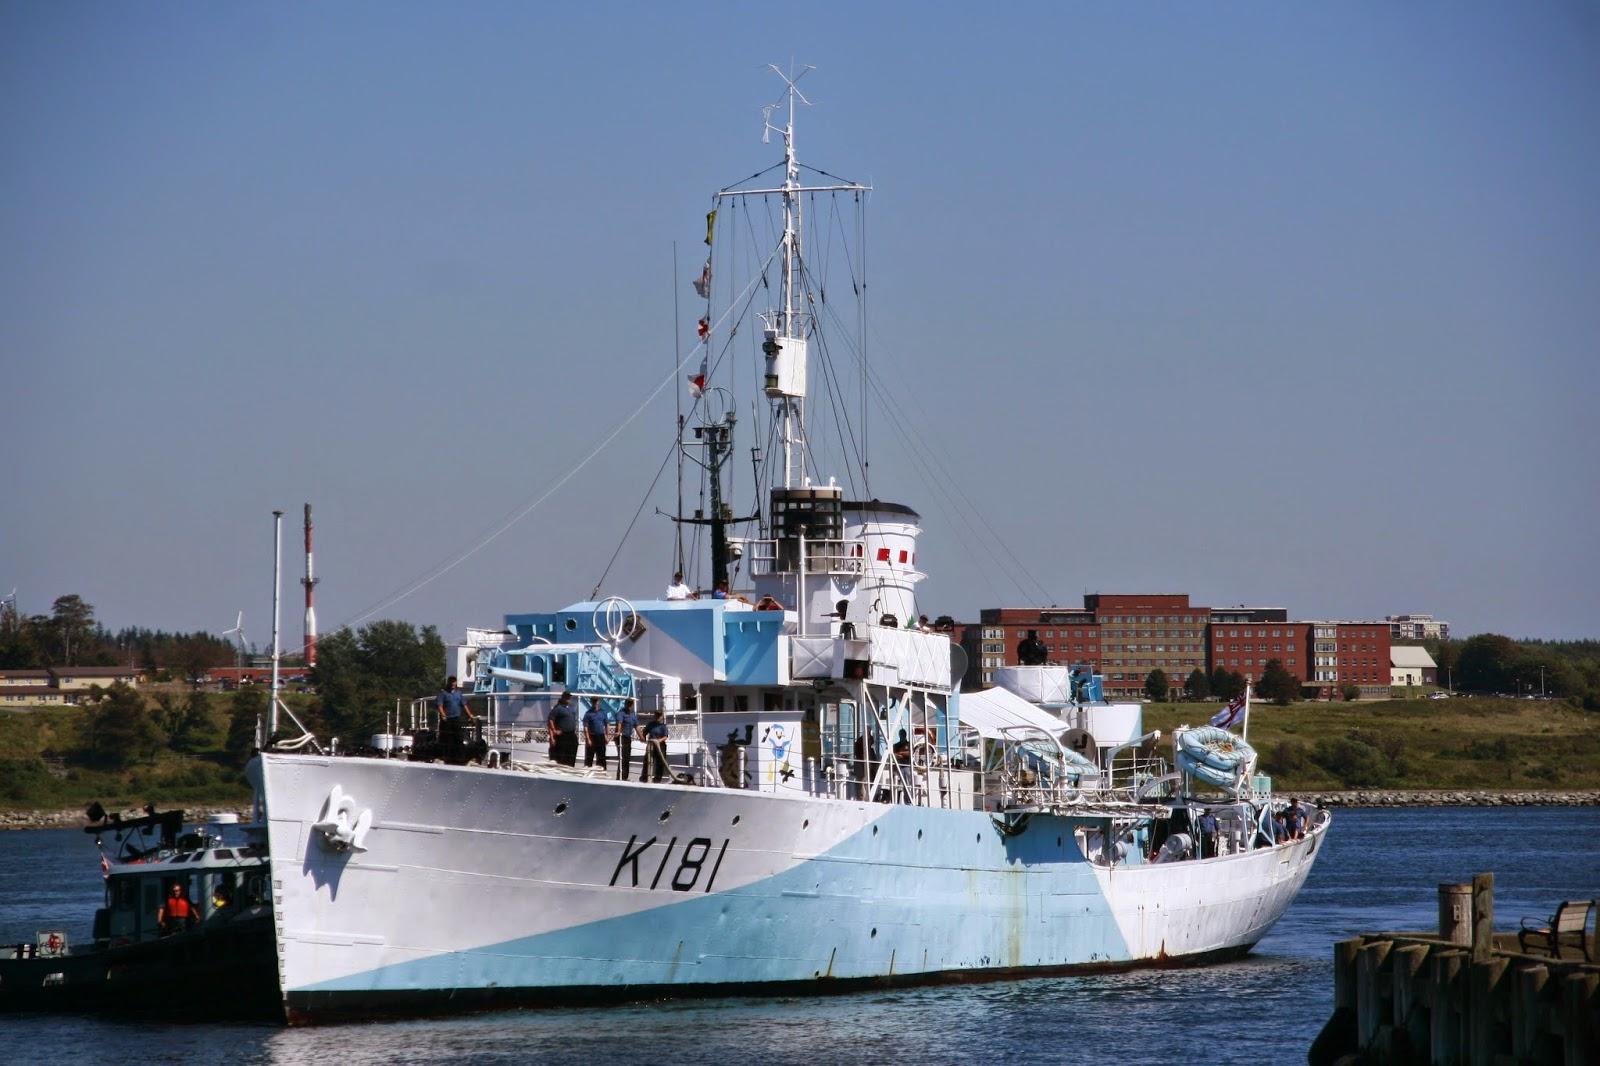 3.5 million to repair HMCS Sackville